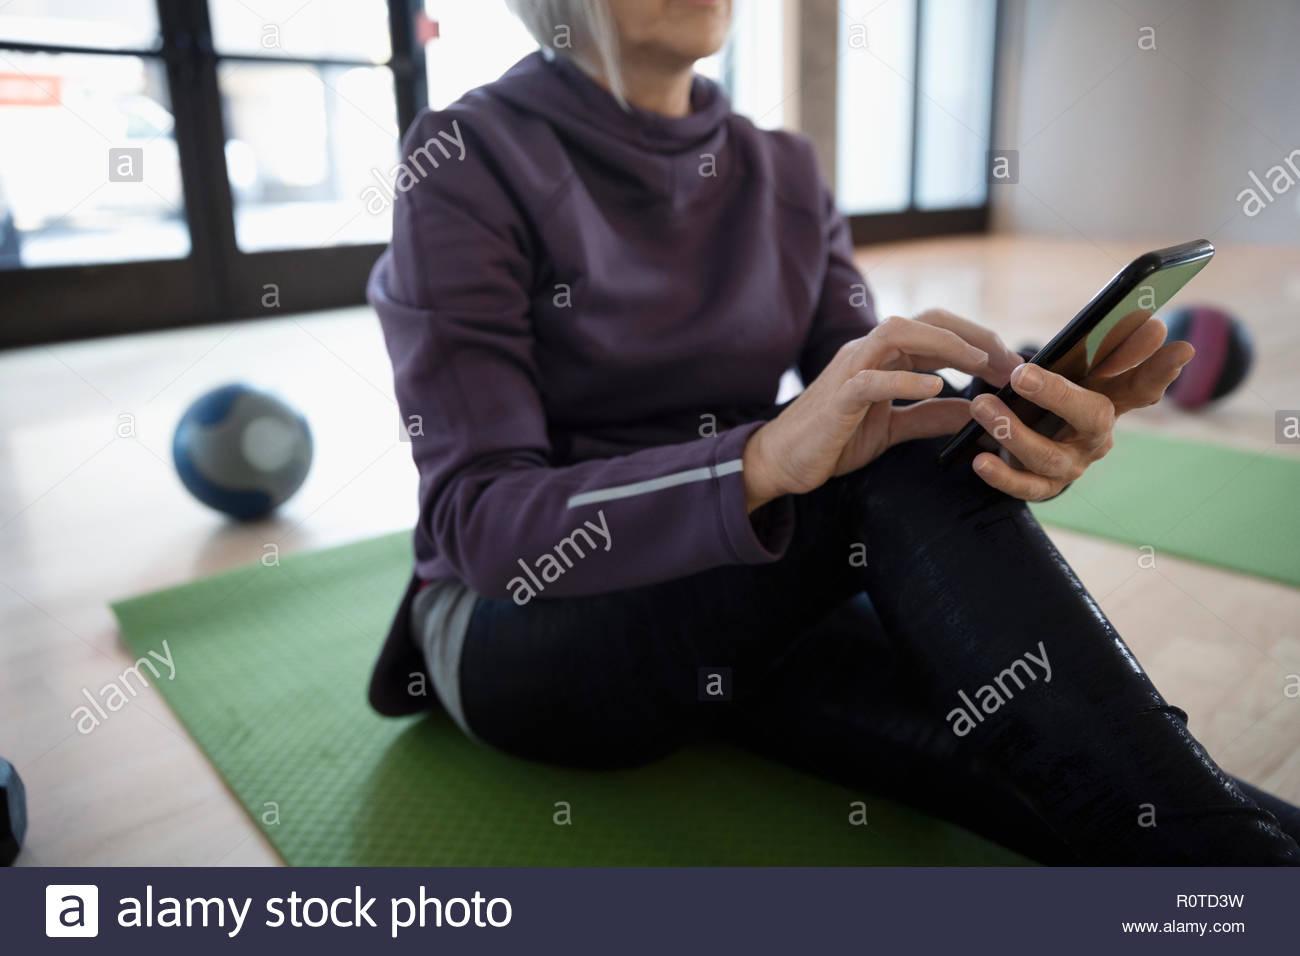 Senior woman using smart phone in gym studio - Stock Image